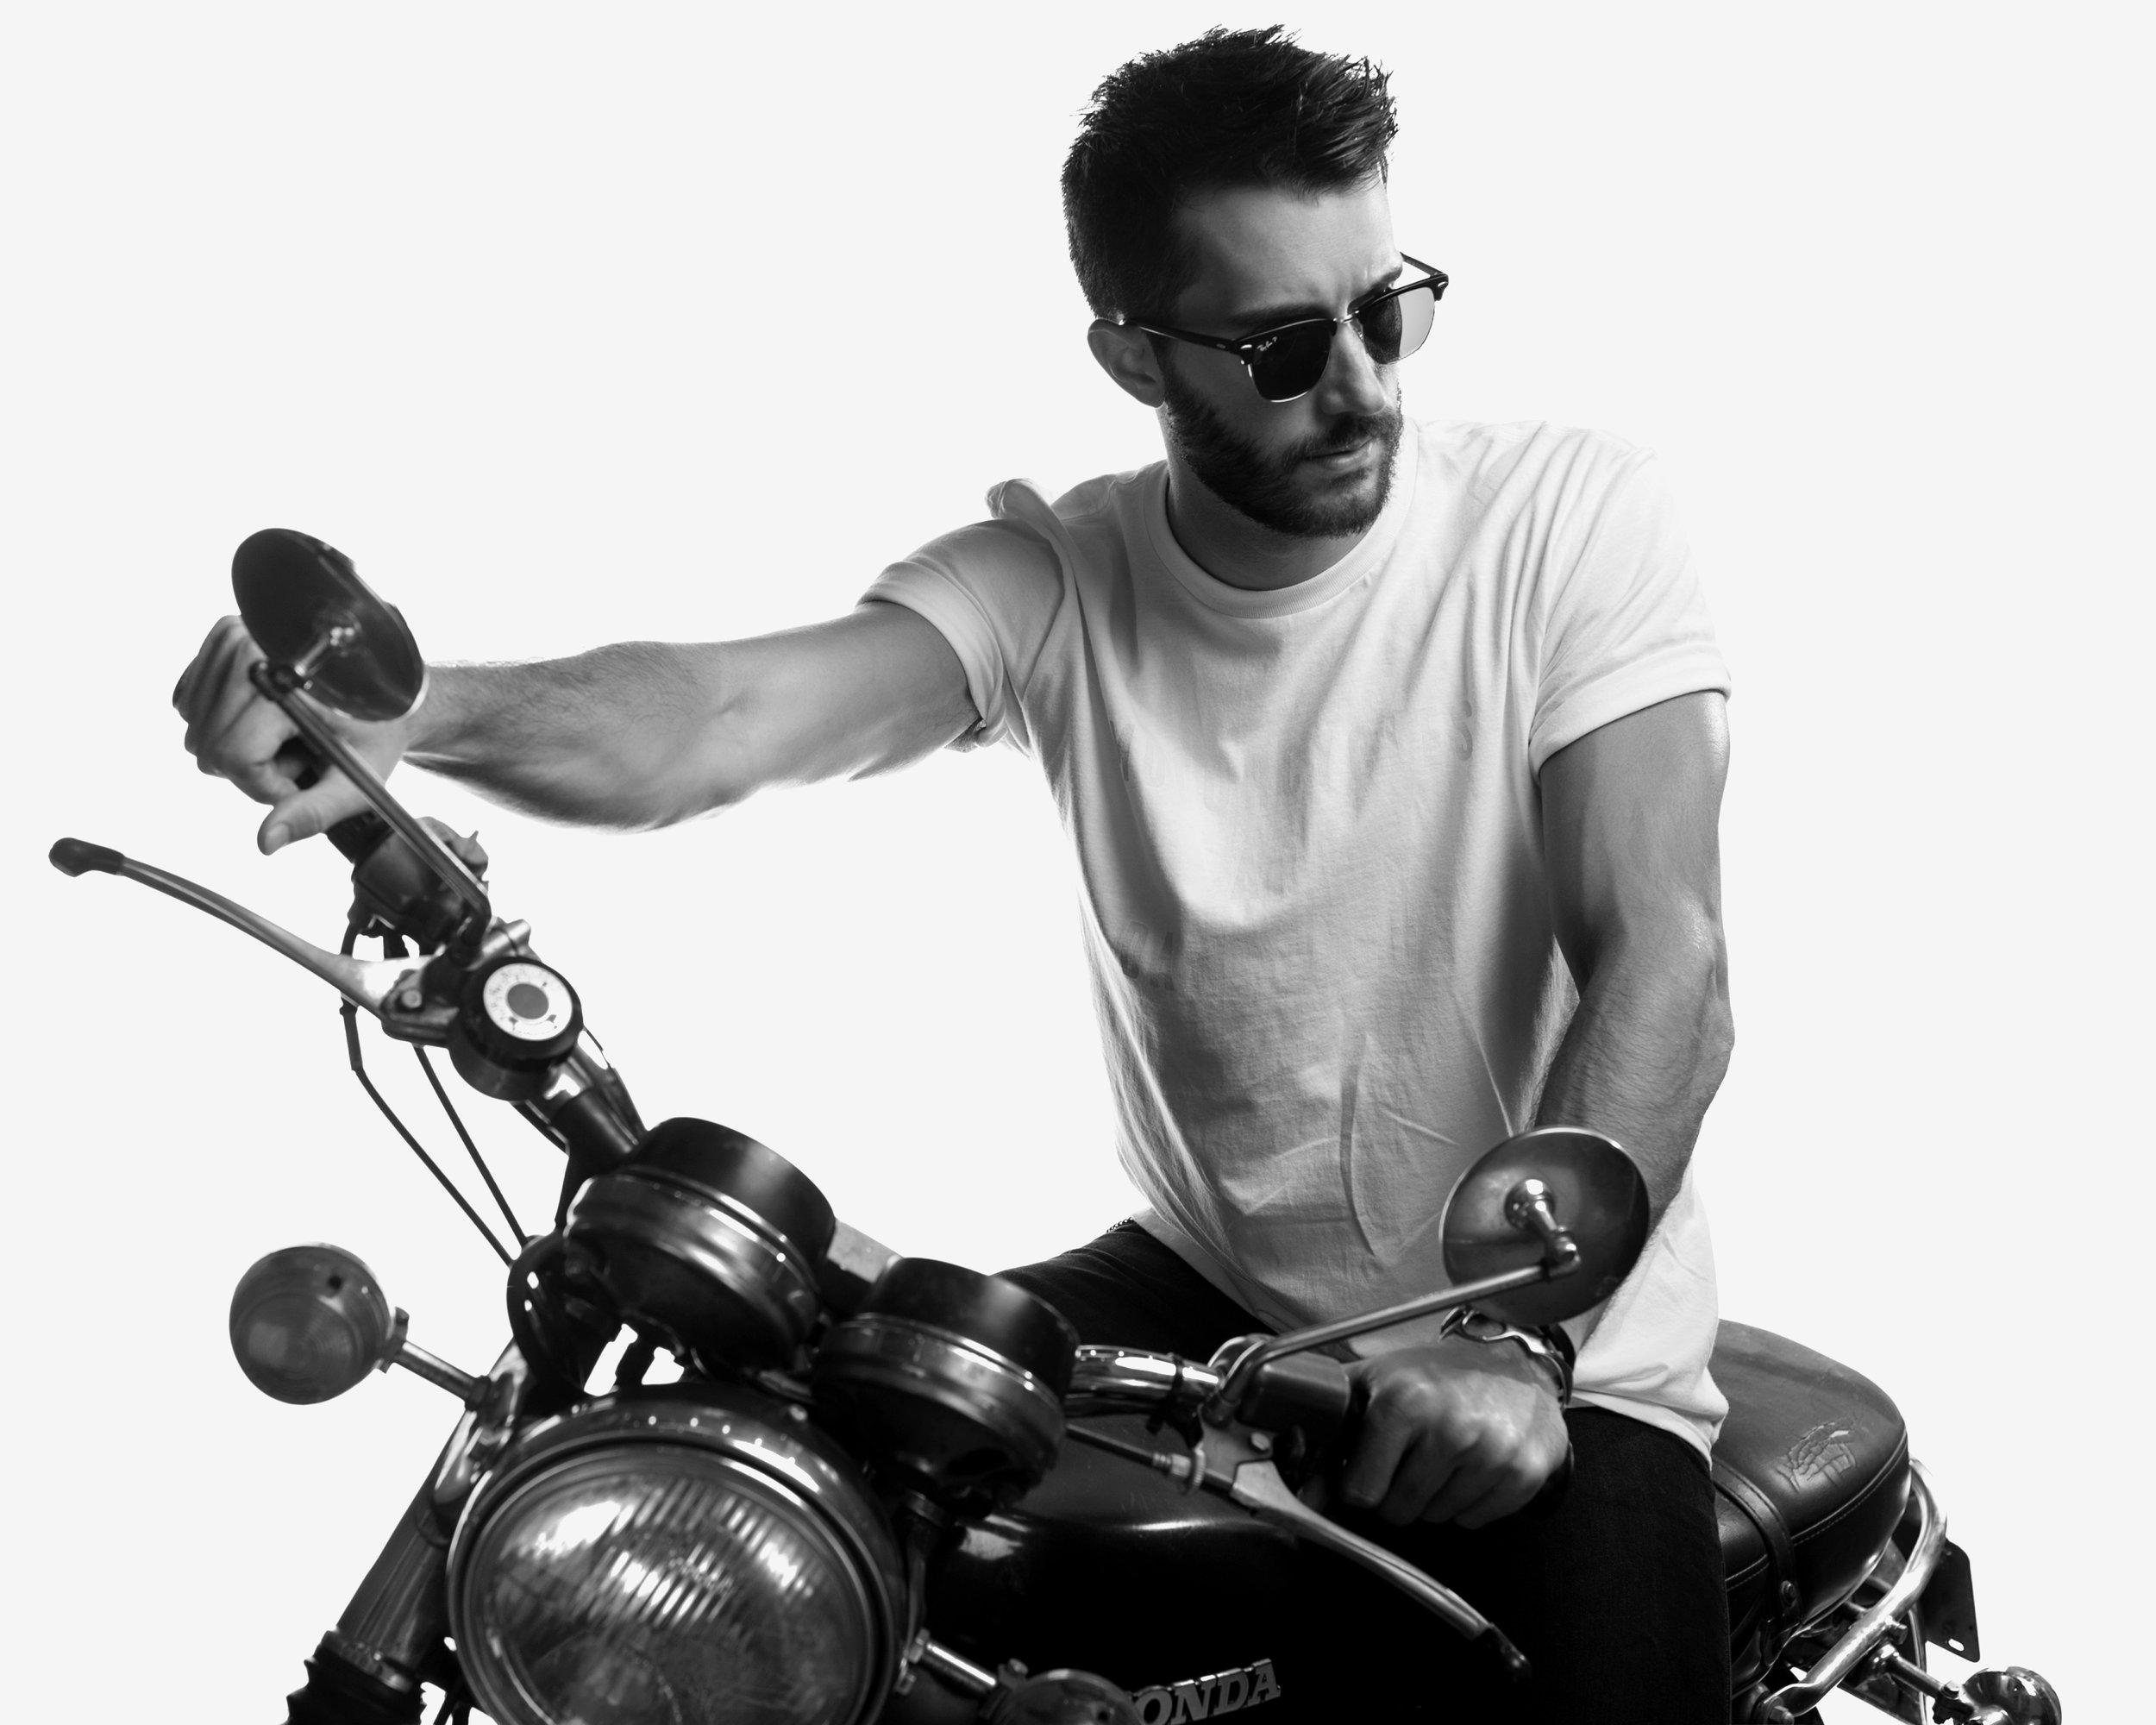 Stephen Wilson Photography - Moto Shoot June 2018-8 BW.jpg